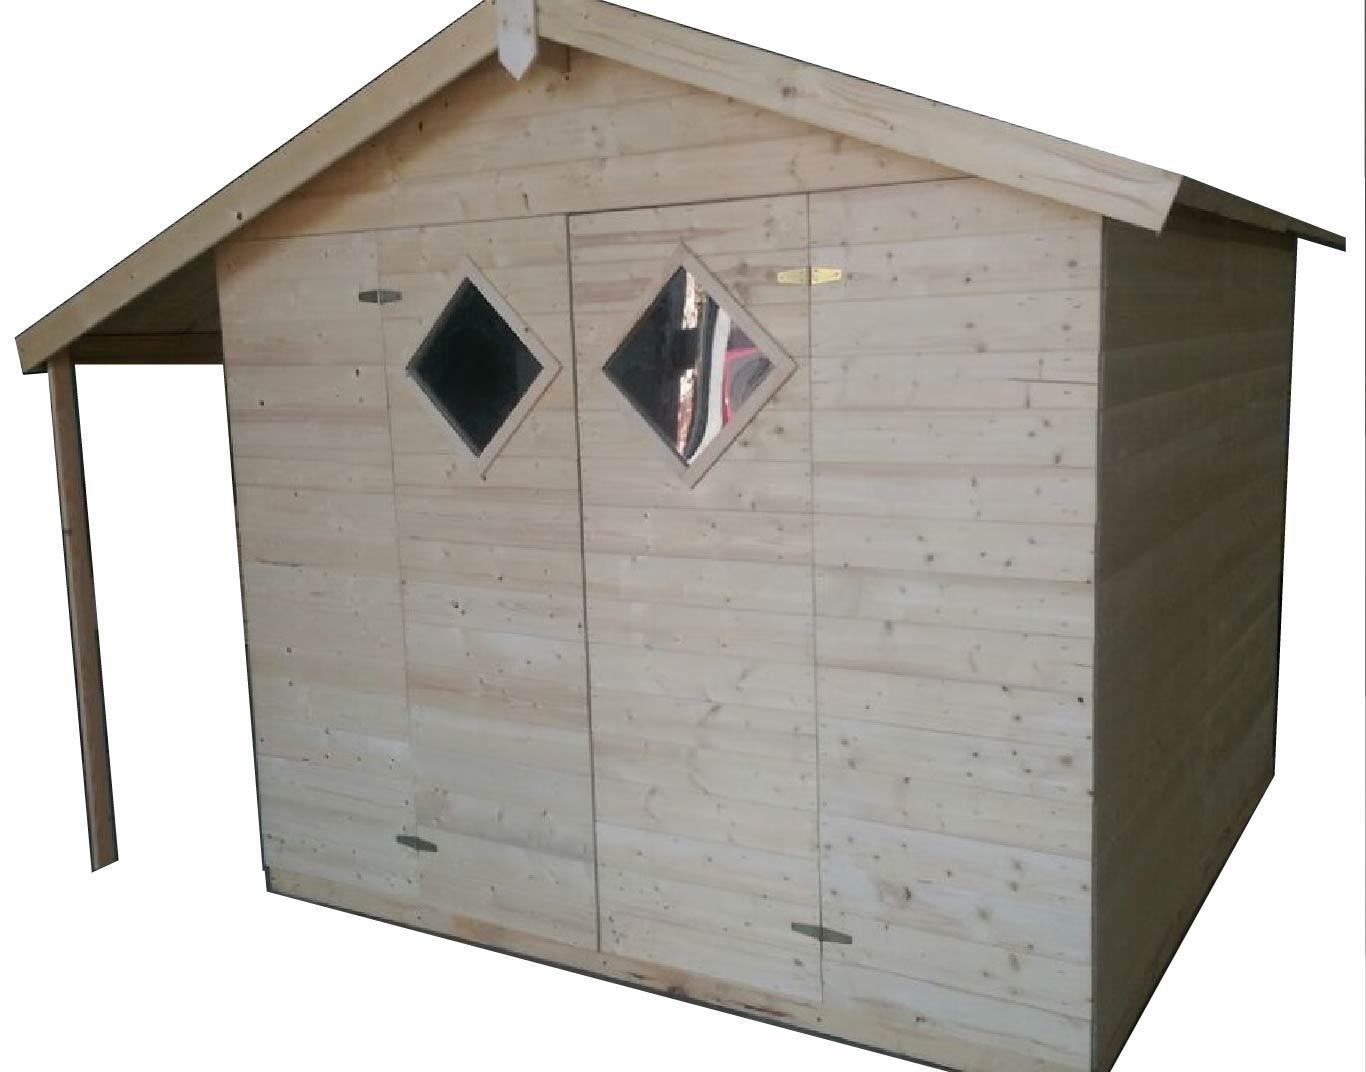 gartenh user bis 12 m2 gartenhaus aus holz 4 0m x 3 3m. Black Bedroom Furniture Sets. Home Design Ideas